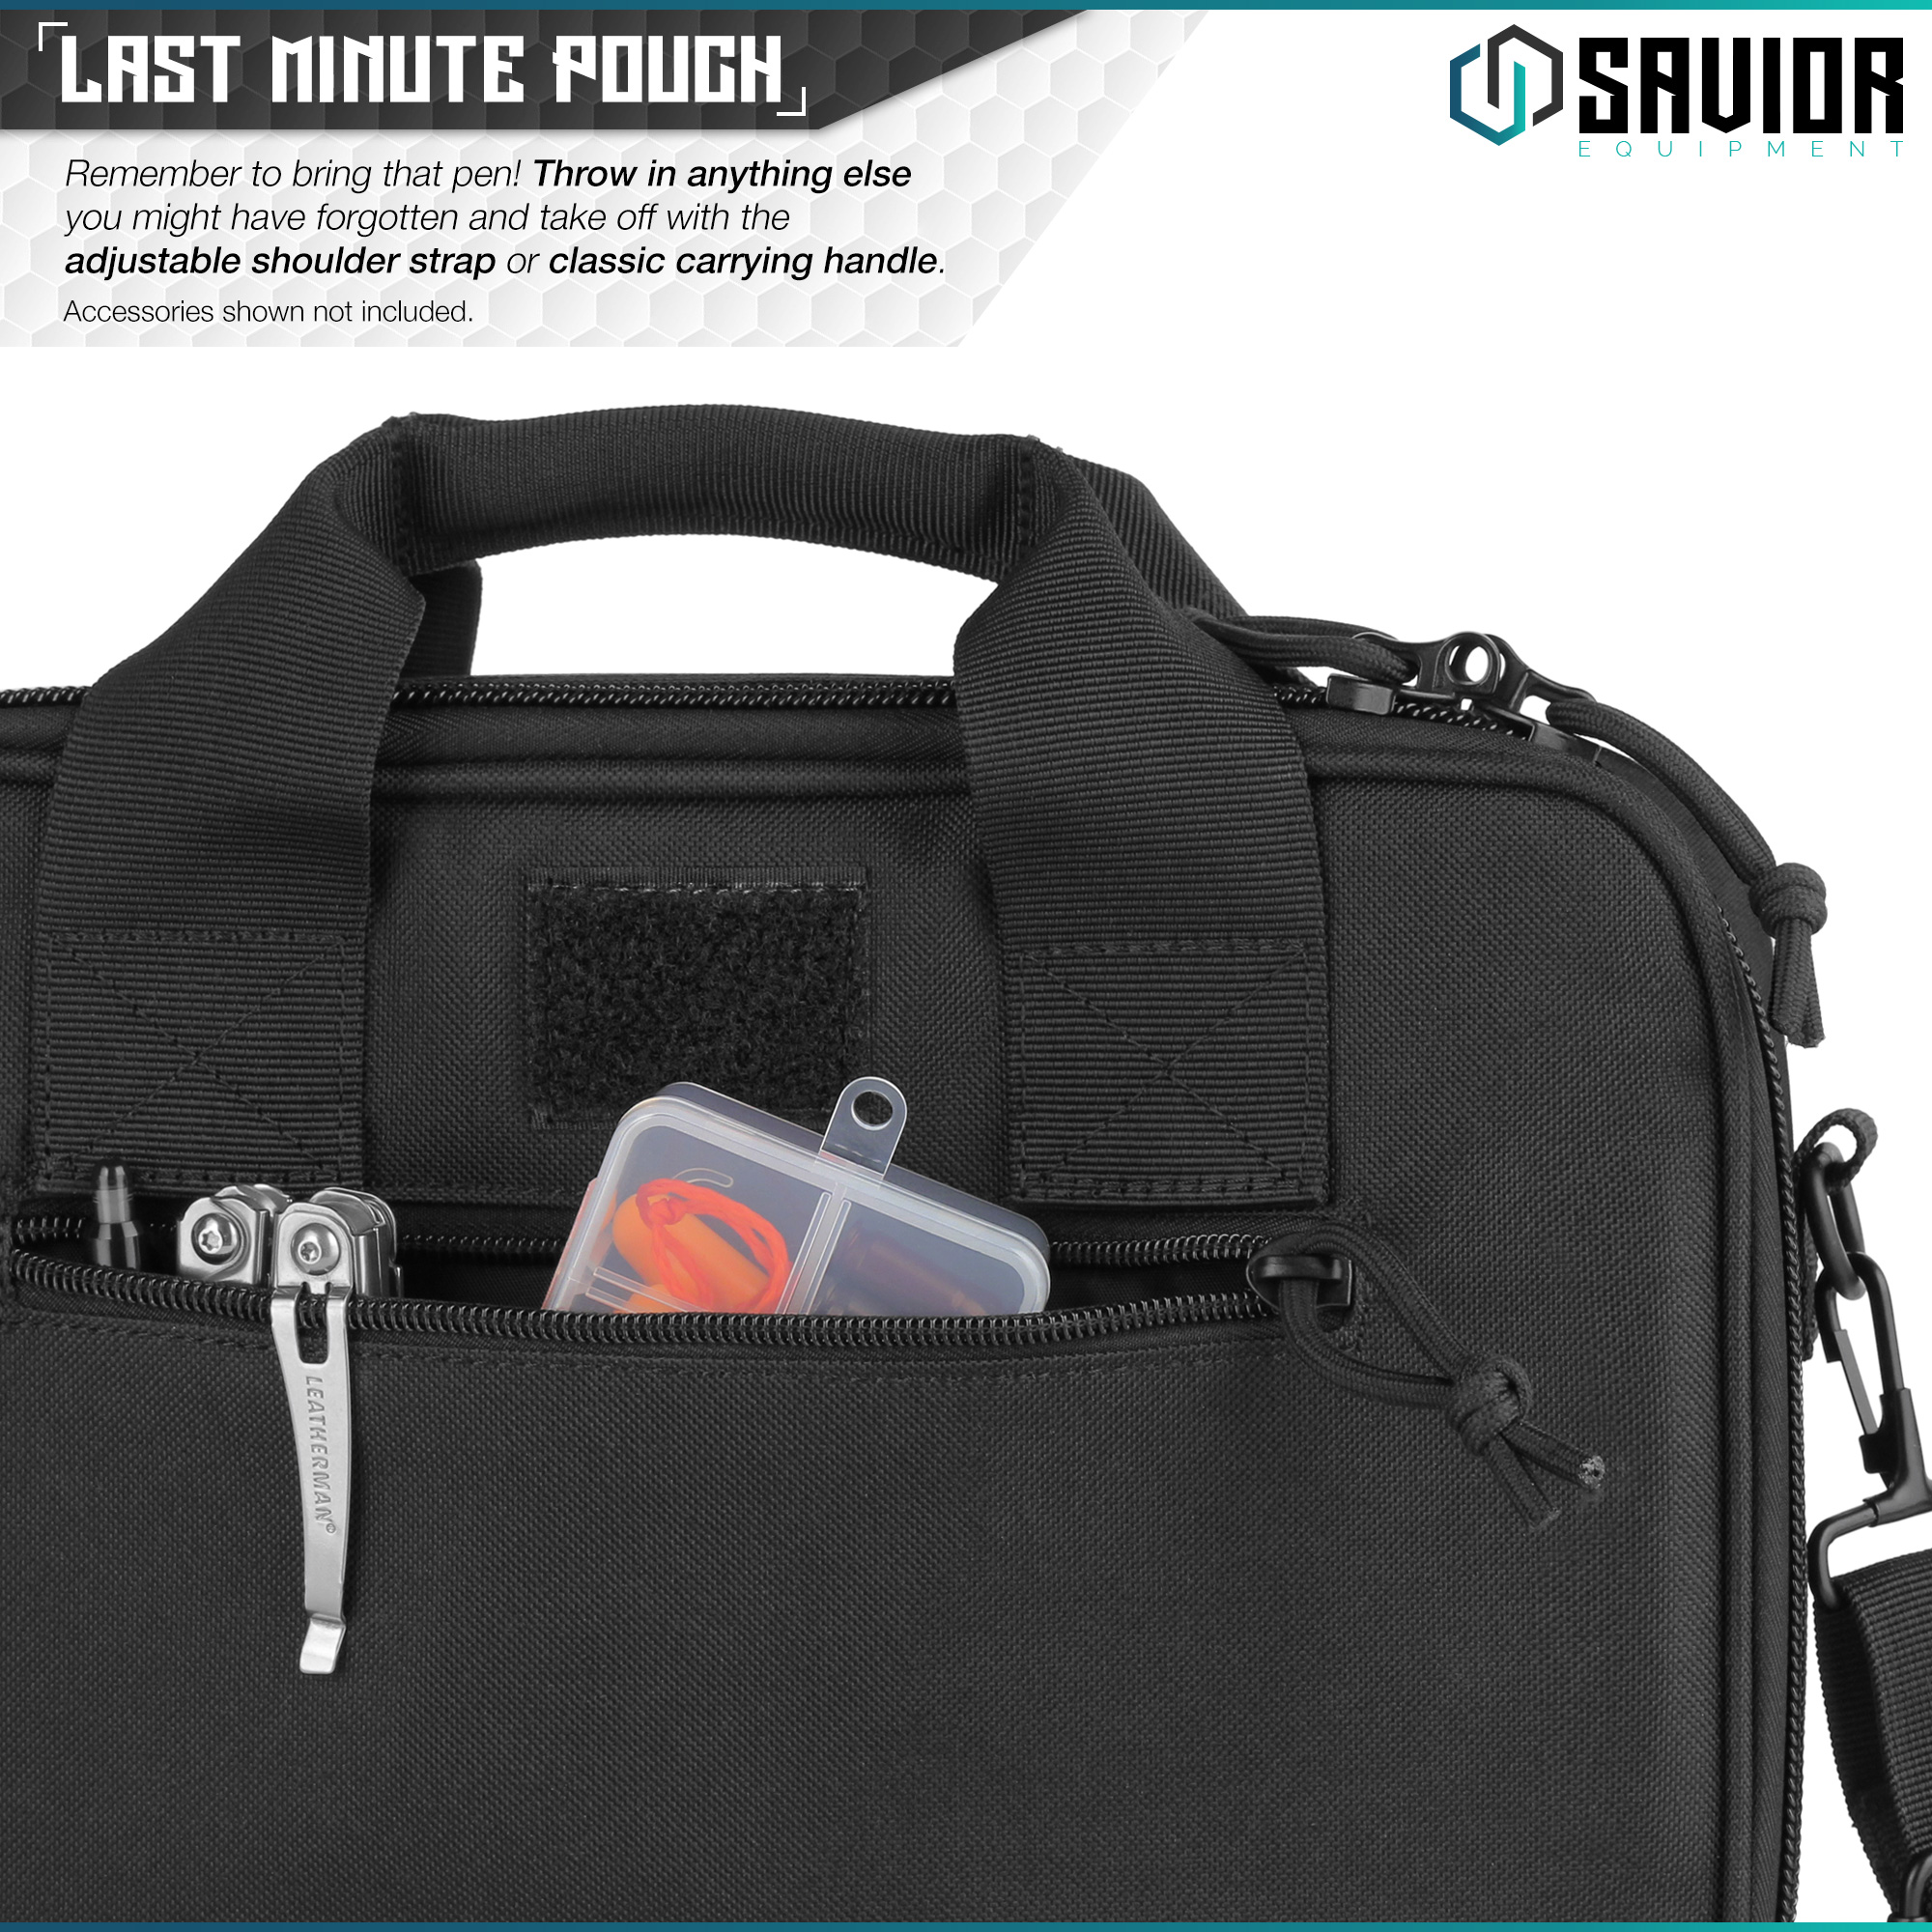 034-SAVIOR-034-Padded-Discreet-Double-Handgun-Bag-Pistol-Storage-Case-w-Mag-Pouch-Slot thumbnail 18